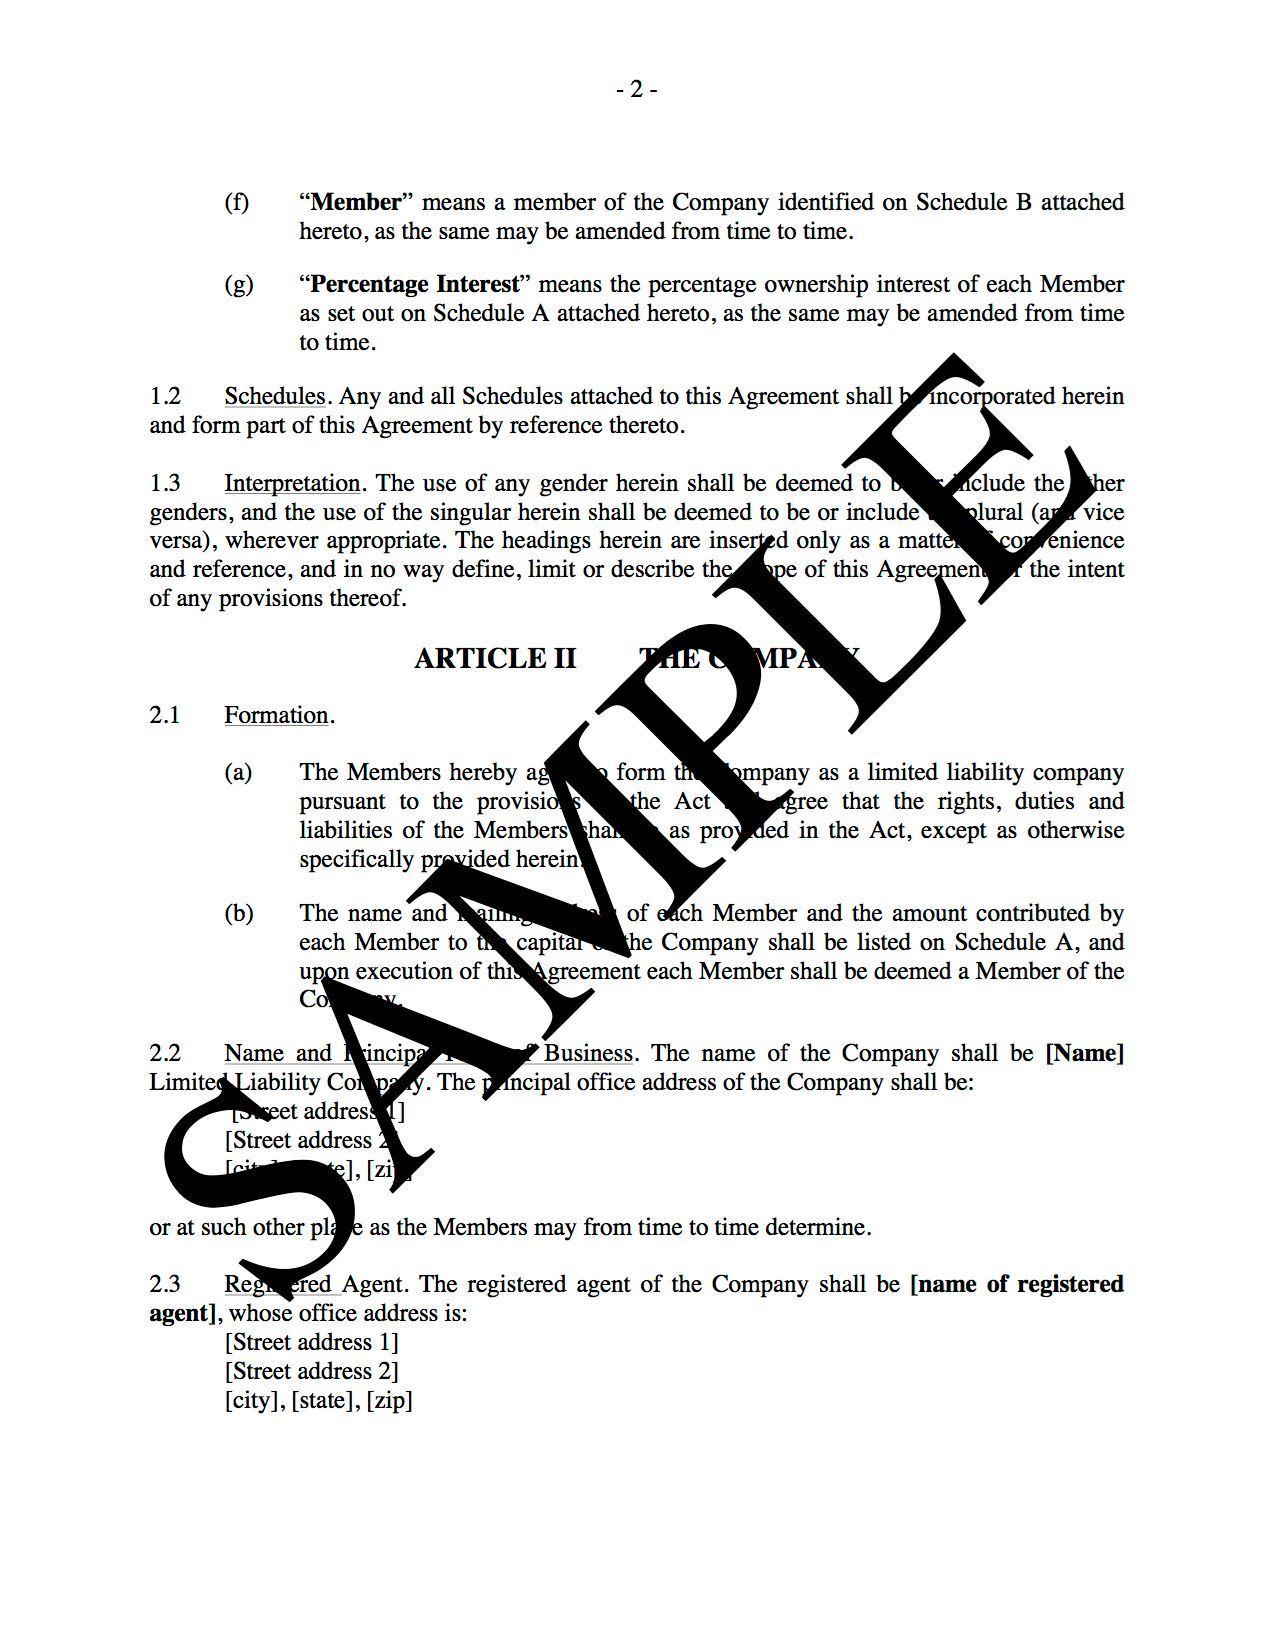 LLC Operating Agreement For Real Estate Development